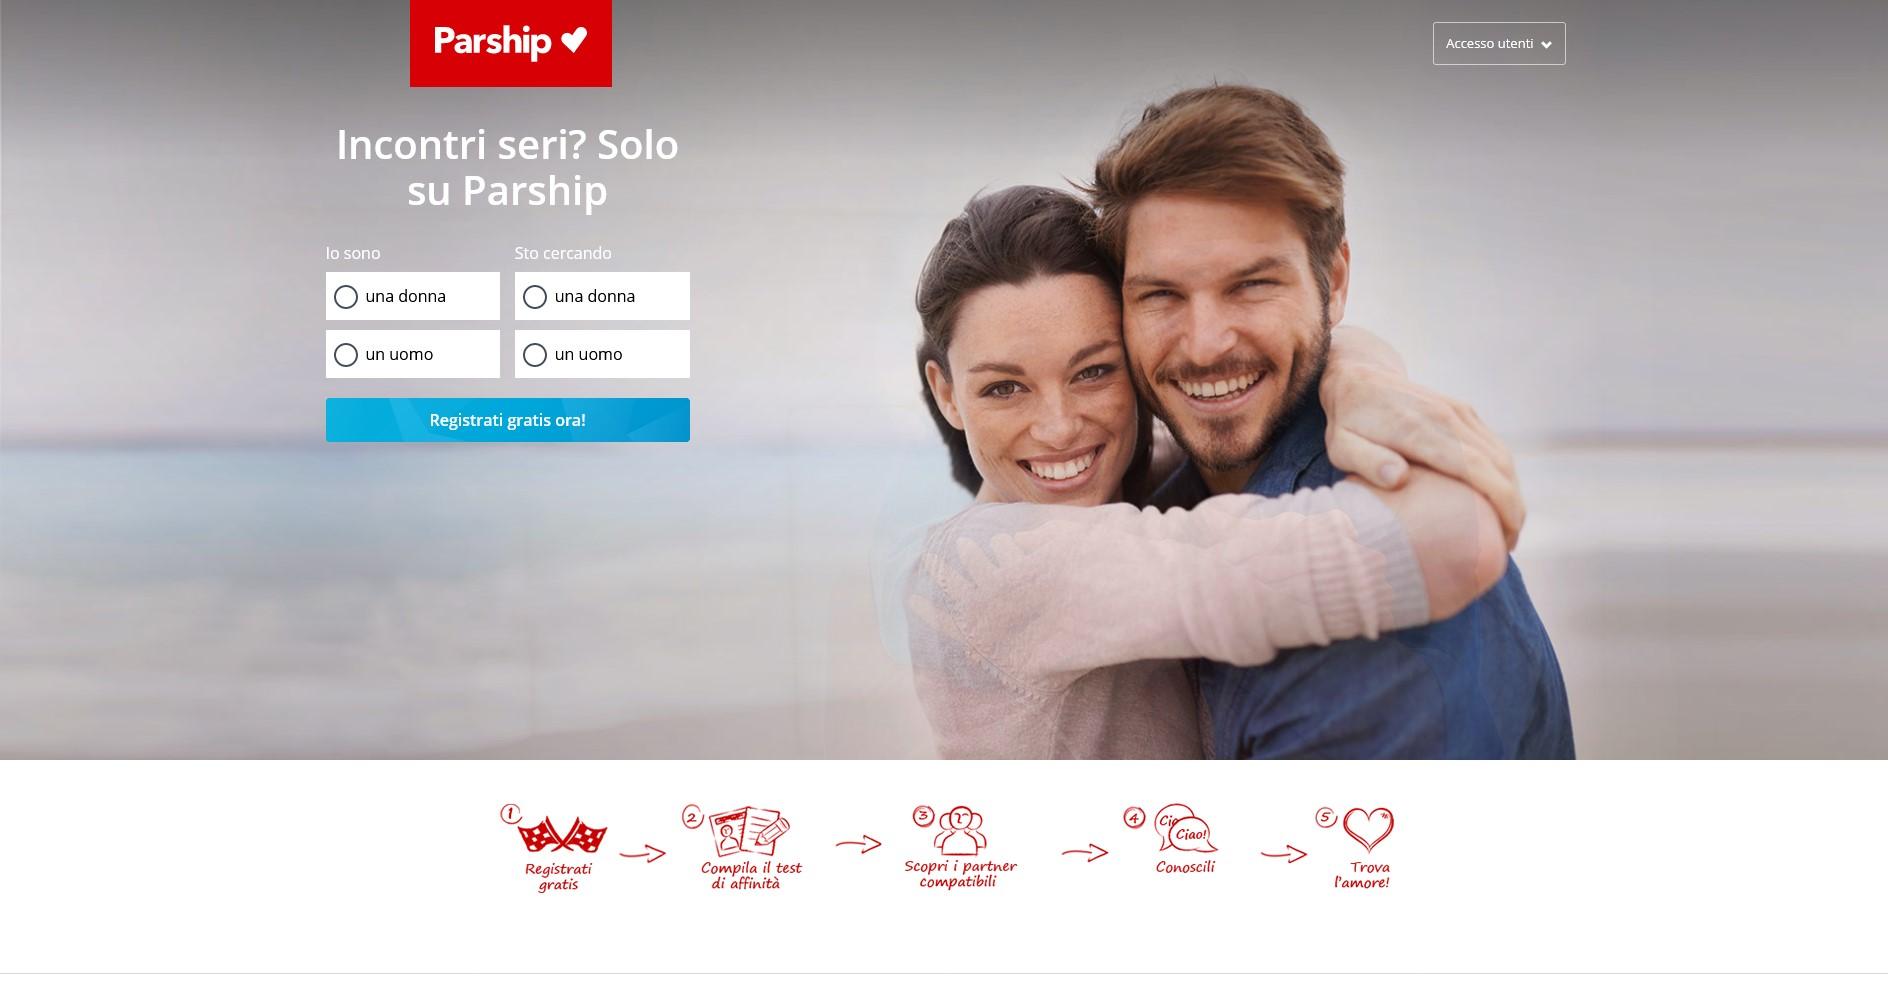 parship.com